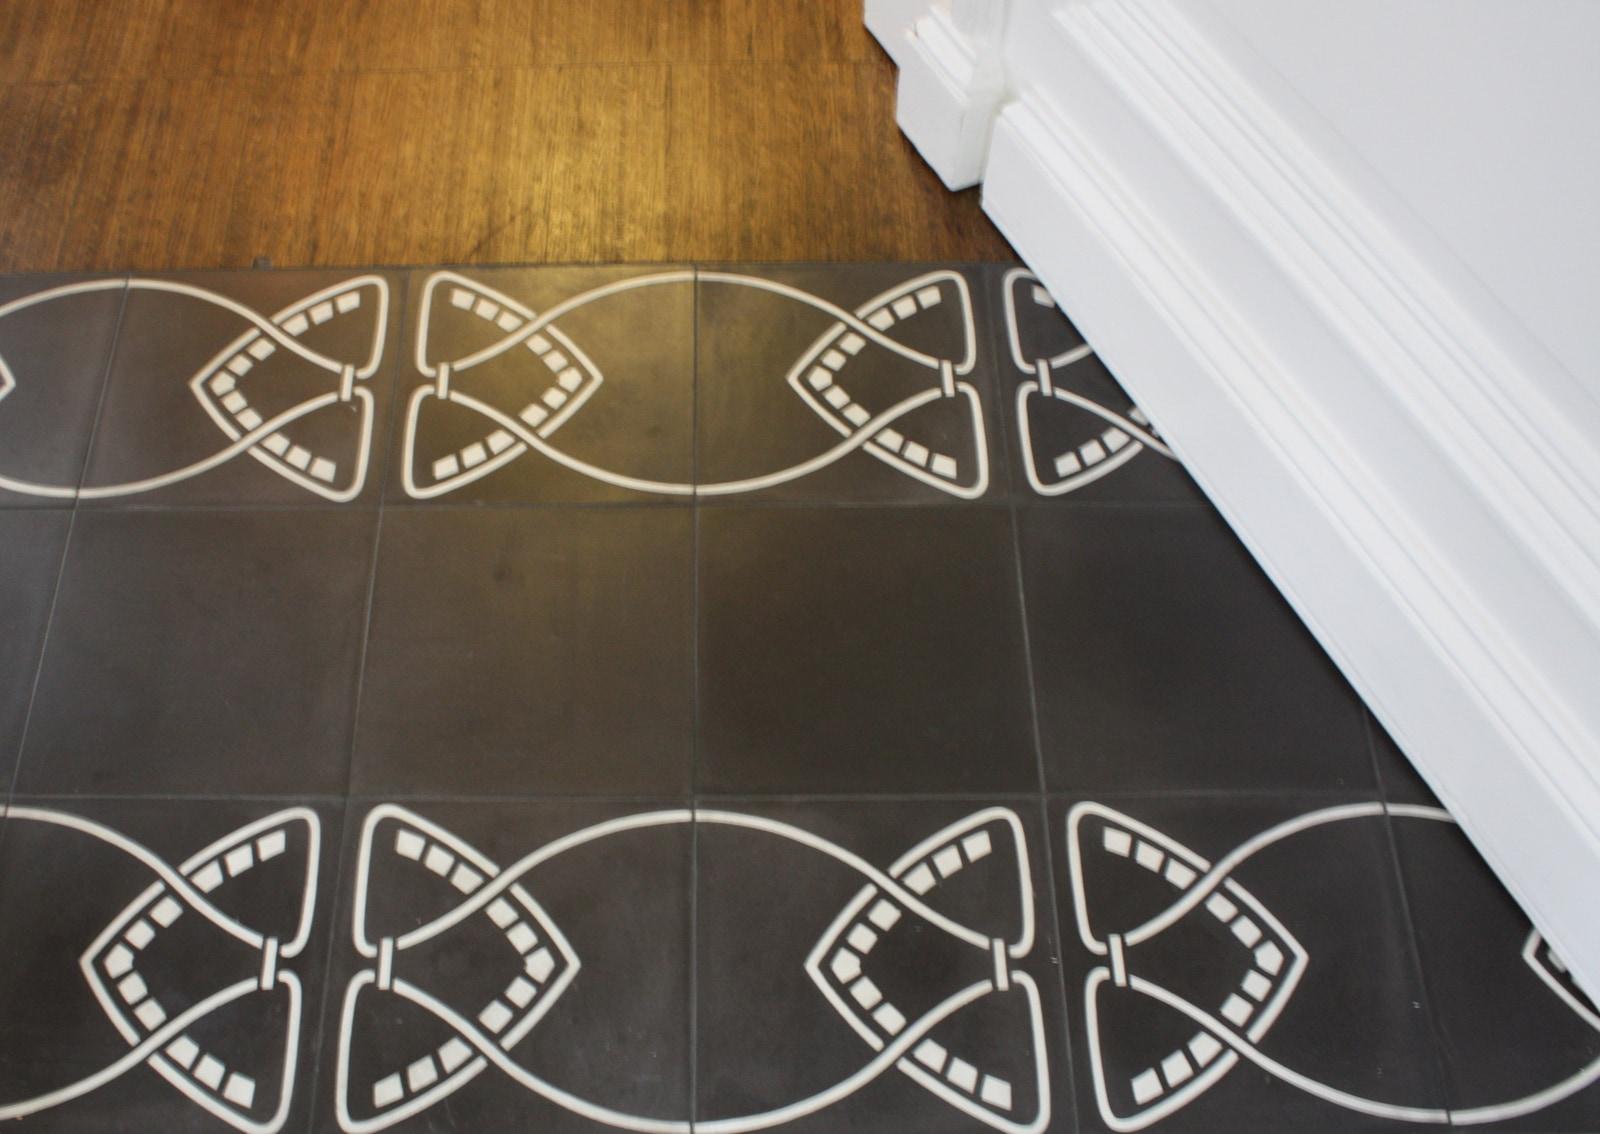 zementmosaikplatte-nummer-51019-flur-02-via-gmbh